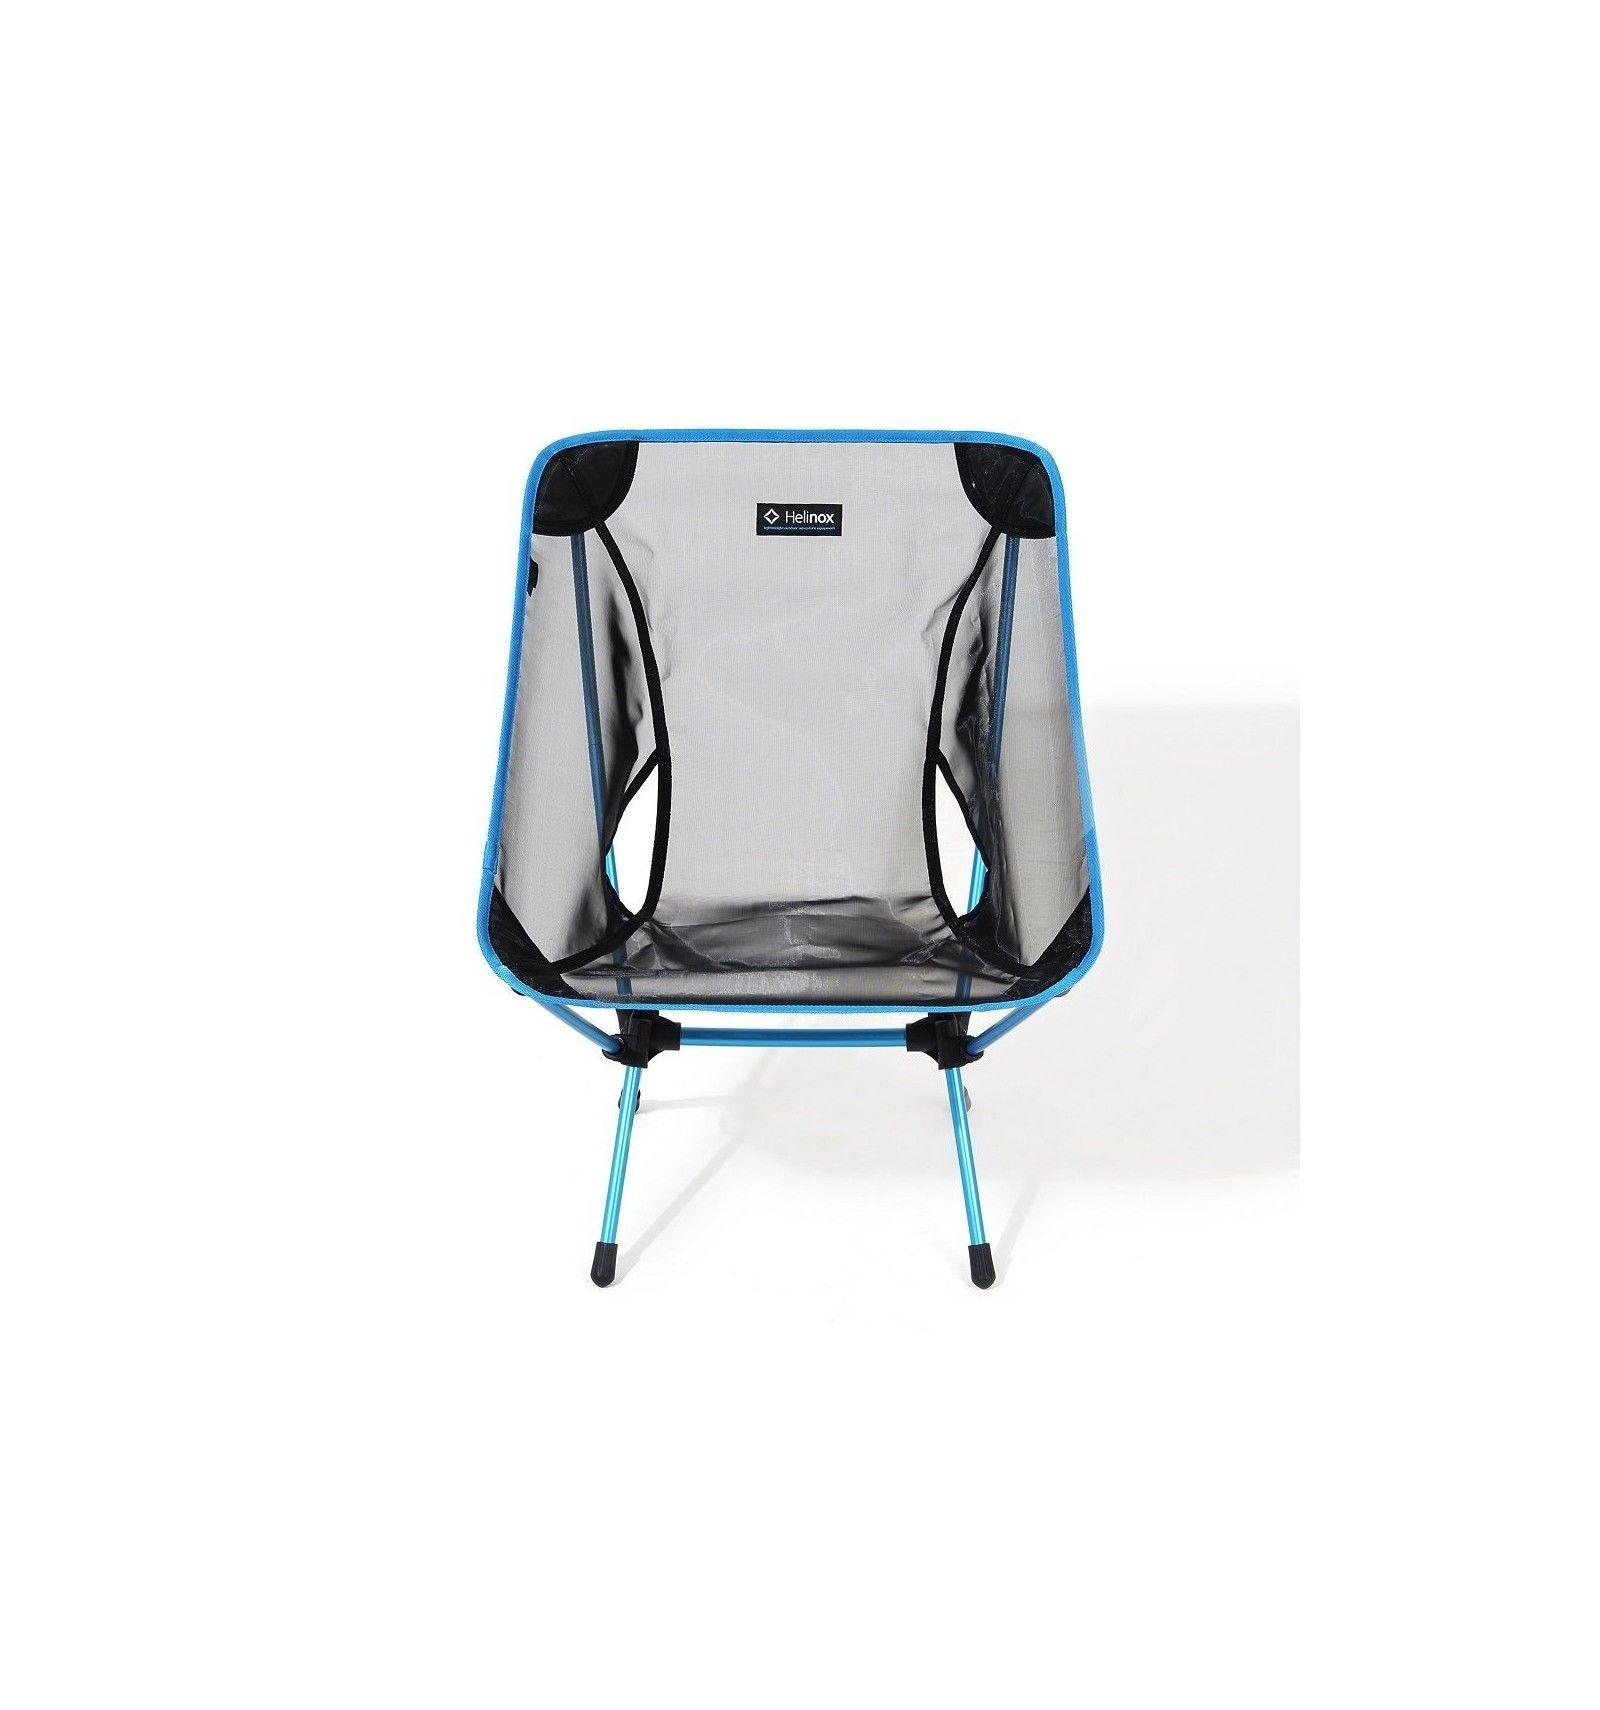 Surprising Helinox Summer Kit Chair One Outpost Machost Co Dining Chair Design Ideas Machostcouk